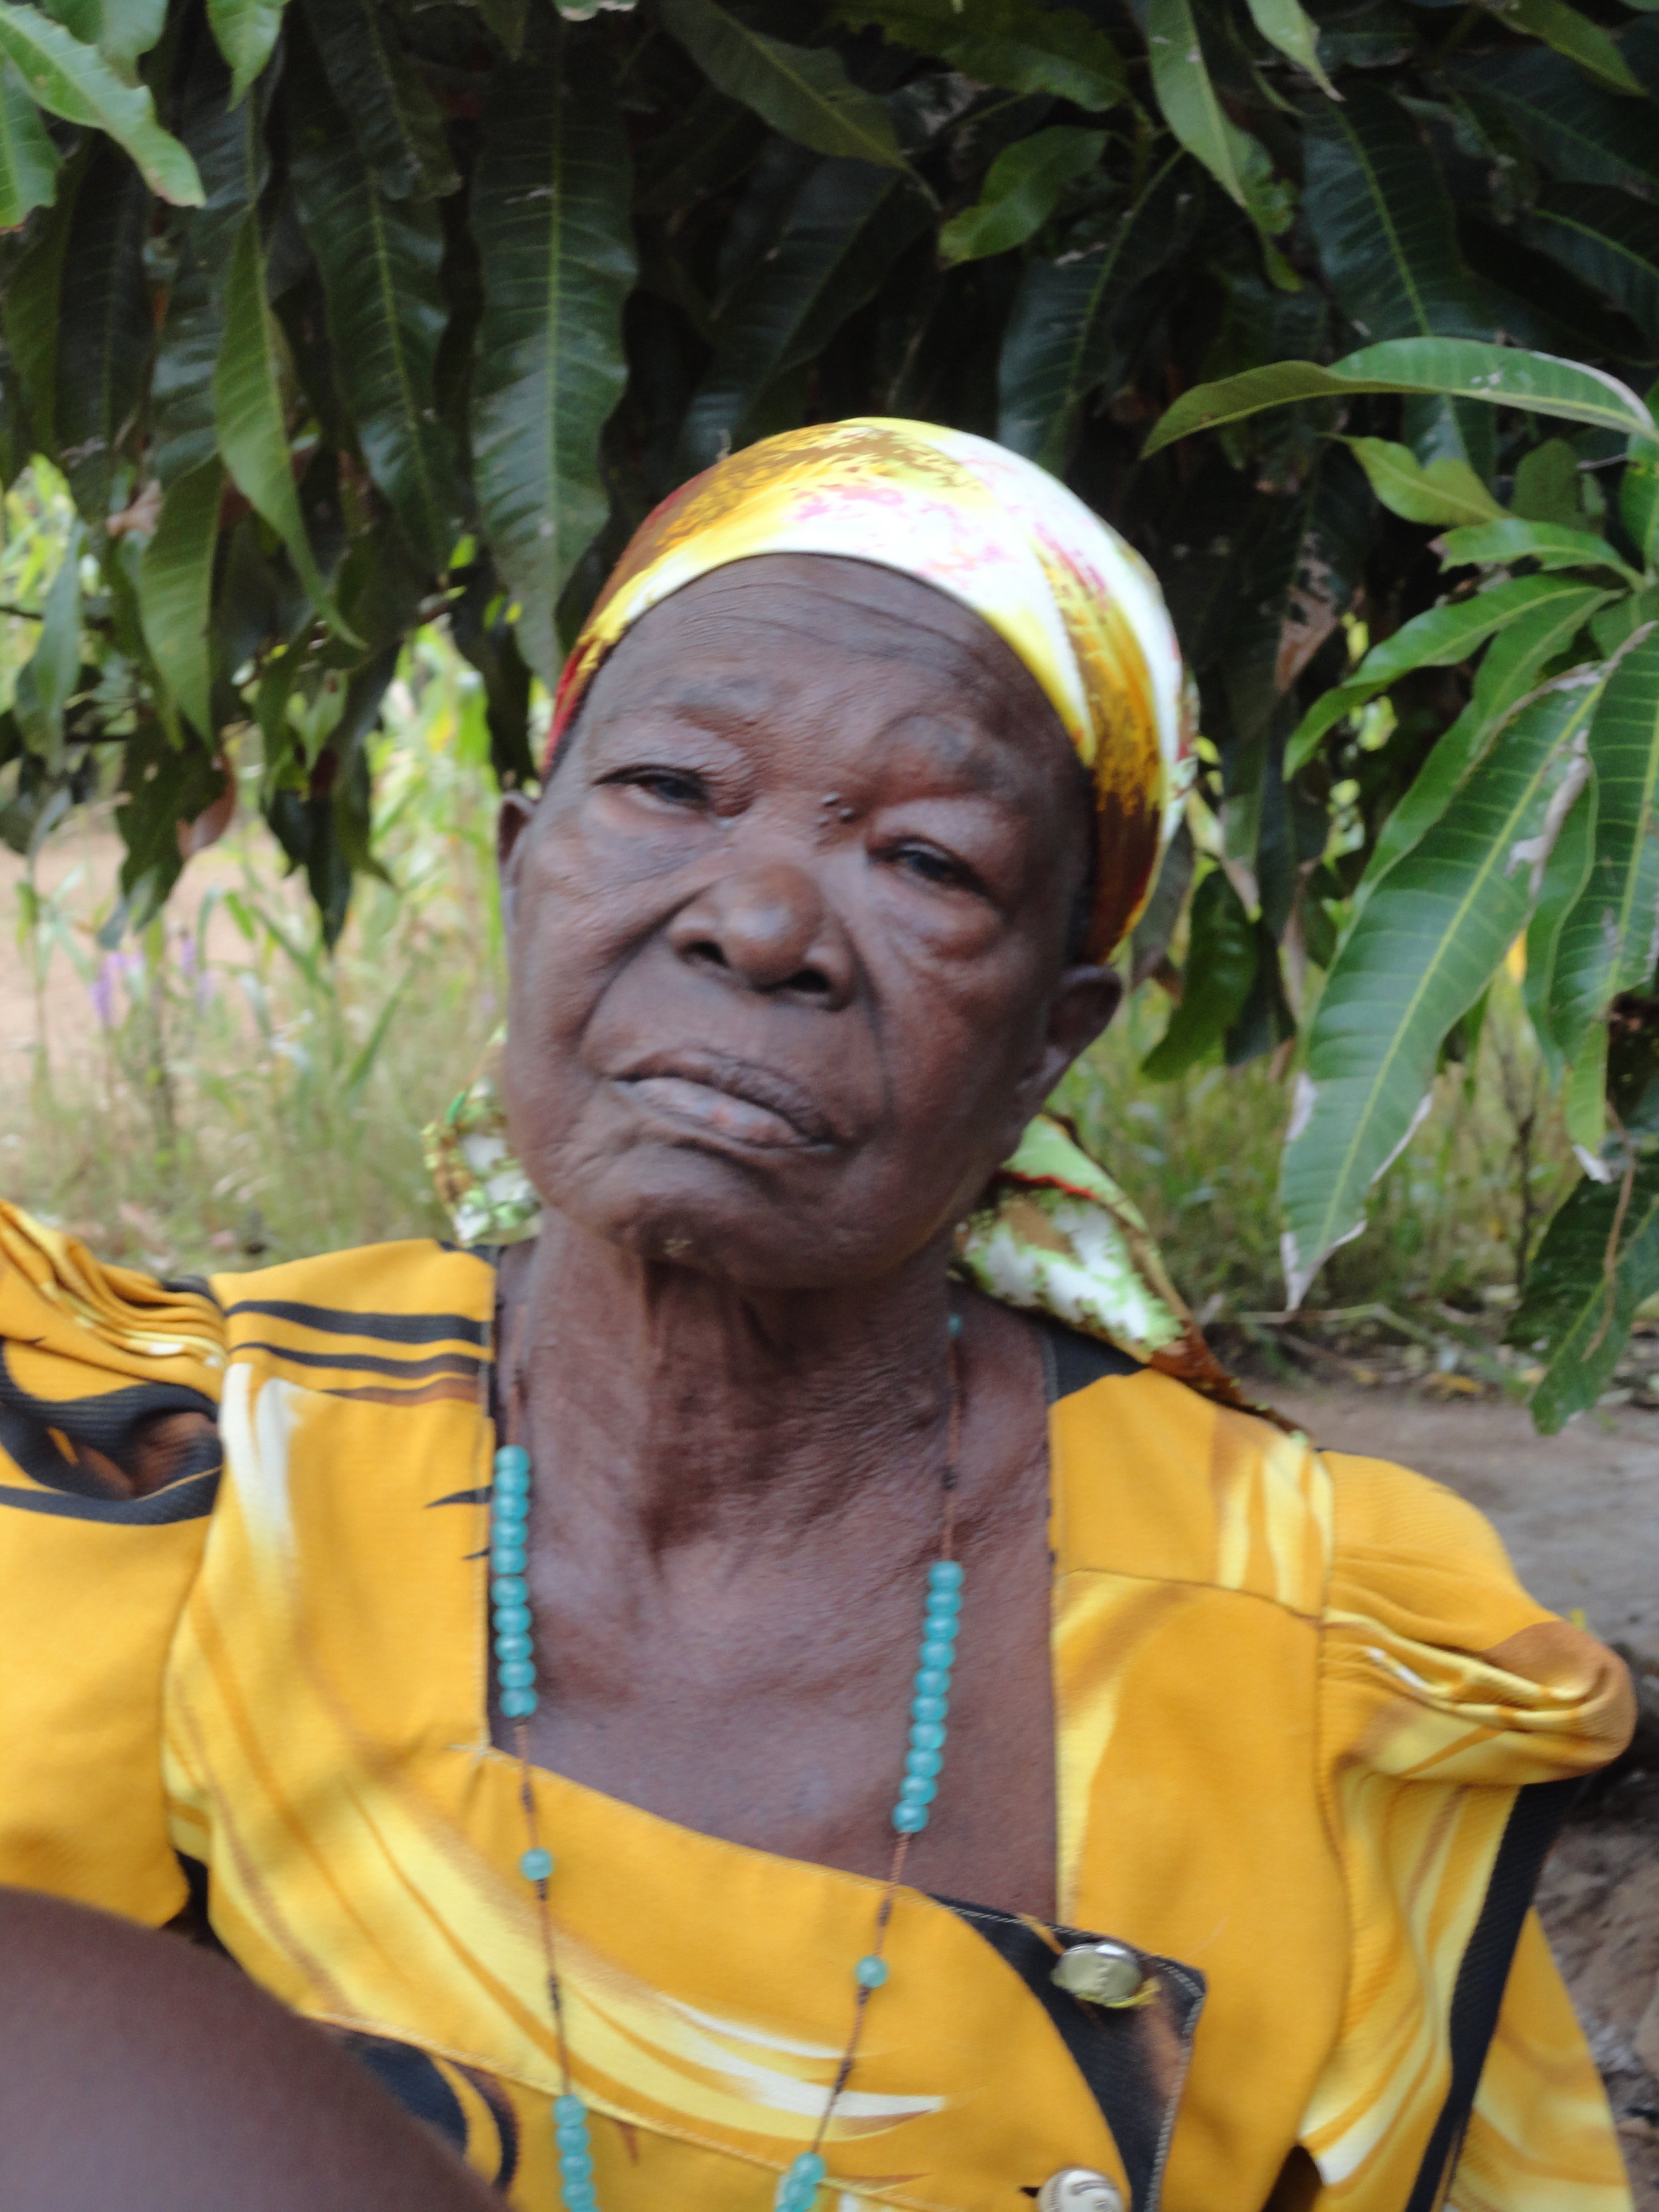 Picture courtesy of Terrewode, Uganda